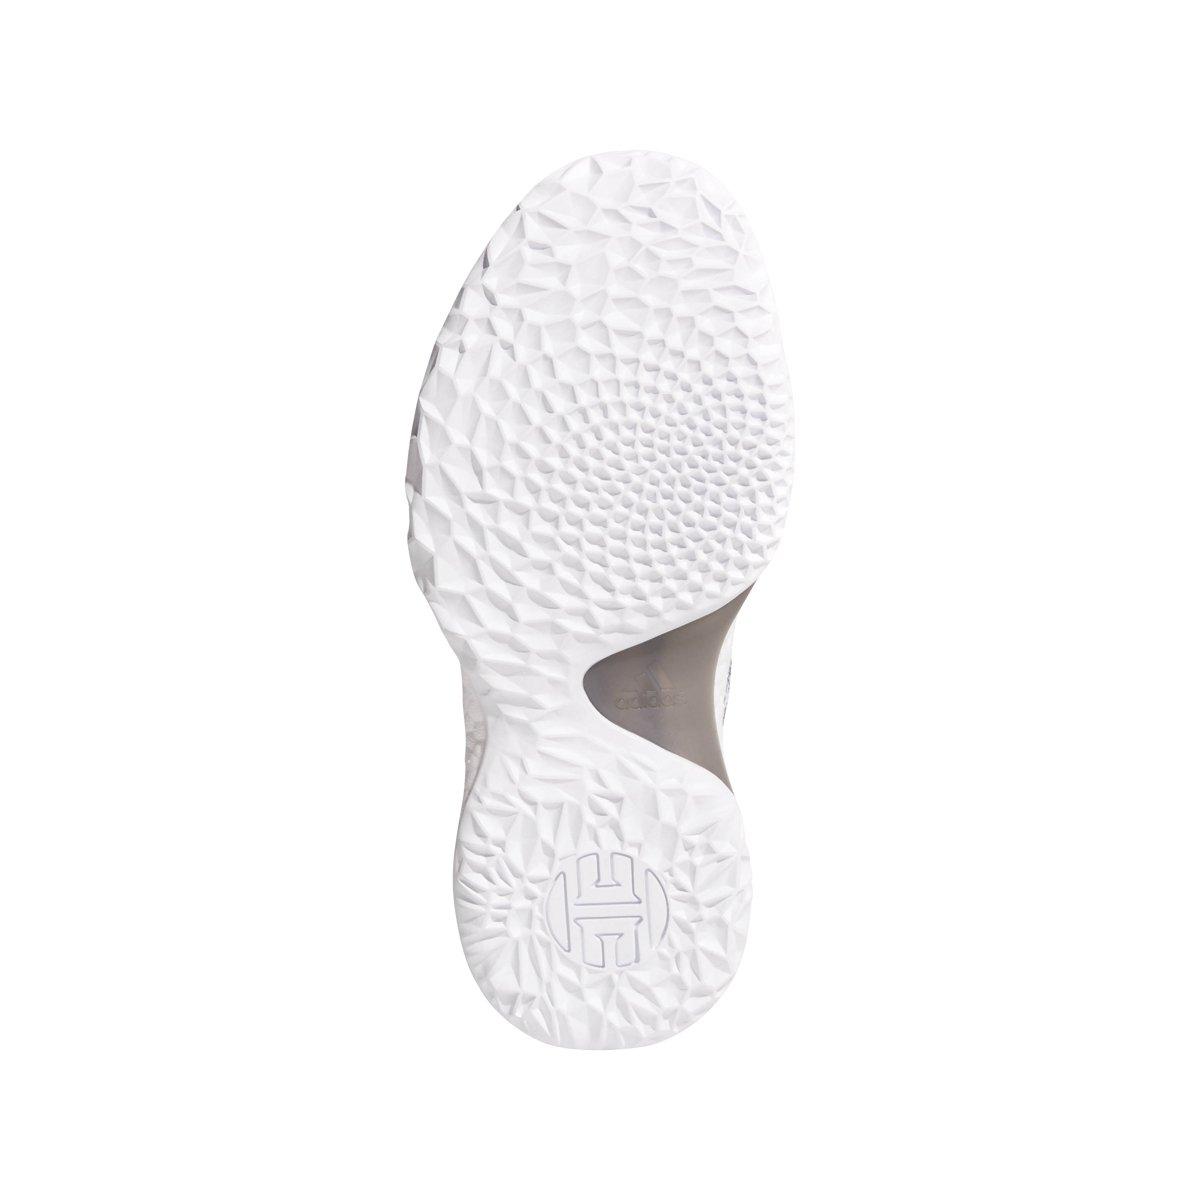 daf3600d172 adidas Harden Vol. 1 LS Primeknit Shoe Junior s Basketball 3.5 White-Core  Black-Grey  Amazon.co.uk  Shoes   Bags